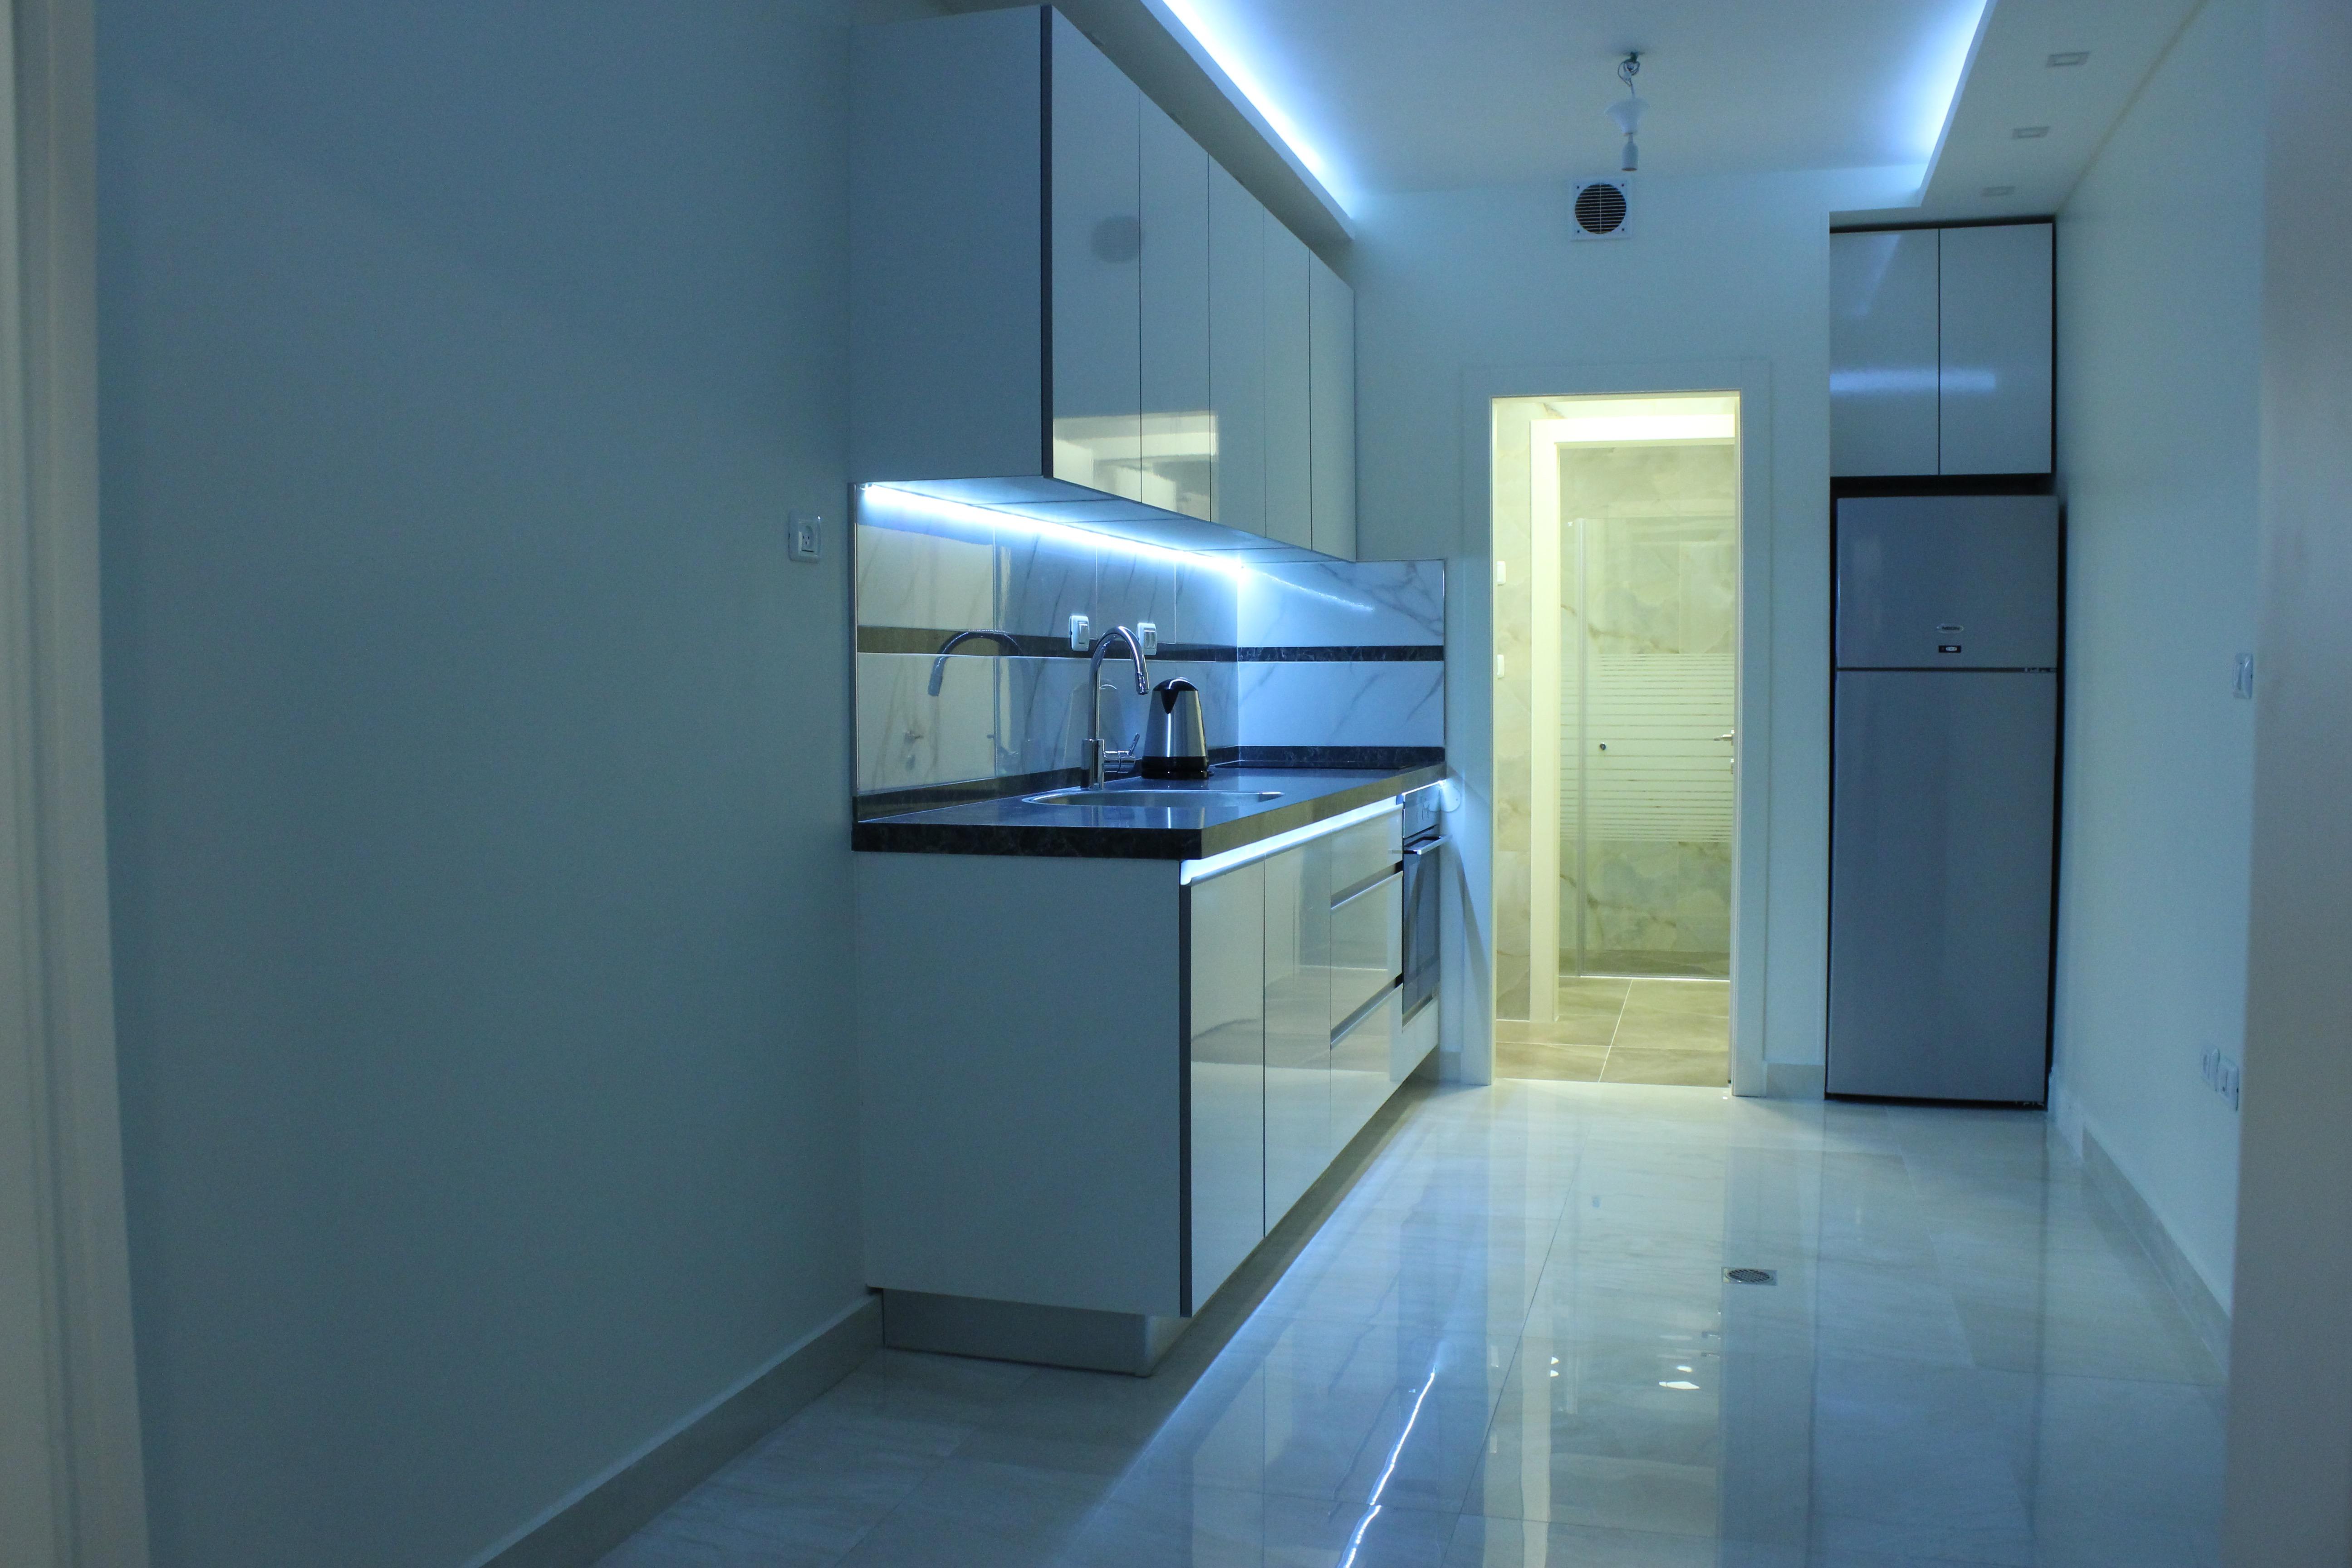 1 Bedroom in Aholiav